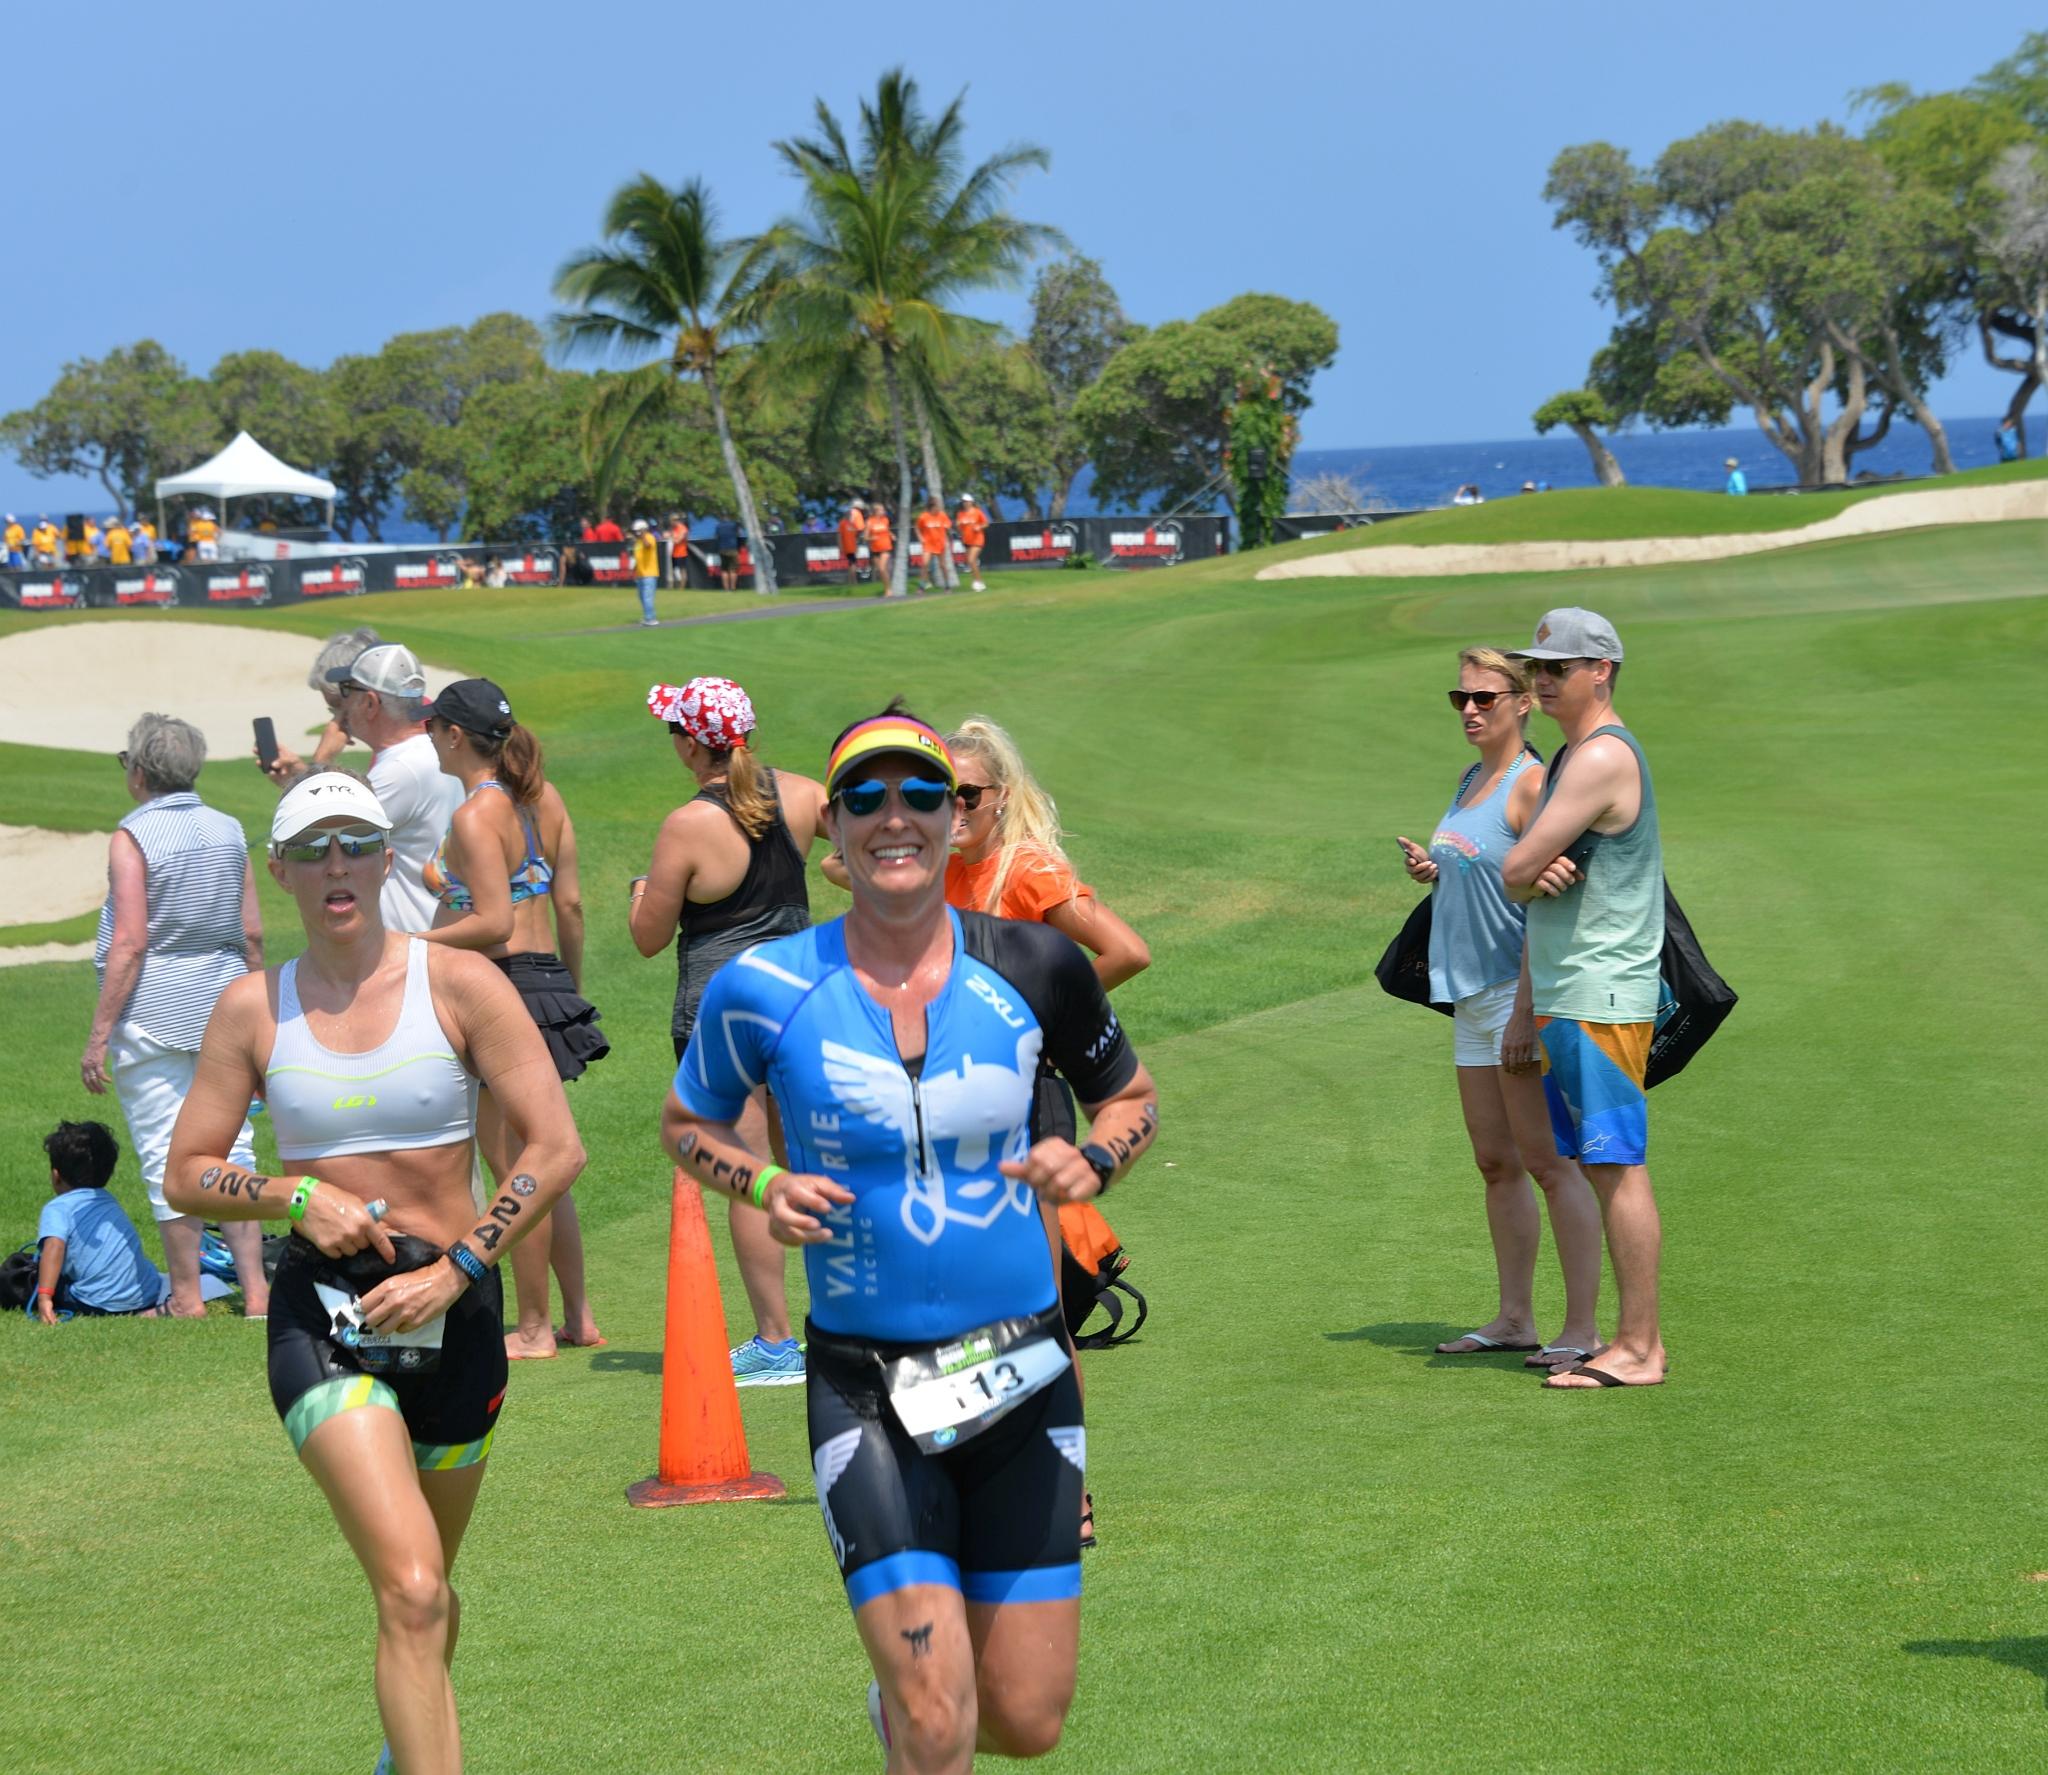 Coach_Terry_Wilson_Gemma_Hollis_Ironman_Hawaii_70.3_Push_Glide_Kick_E3TS_E3_Training_Solutions_6.JPG